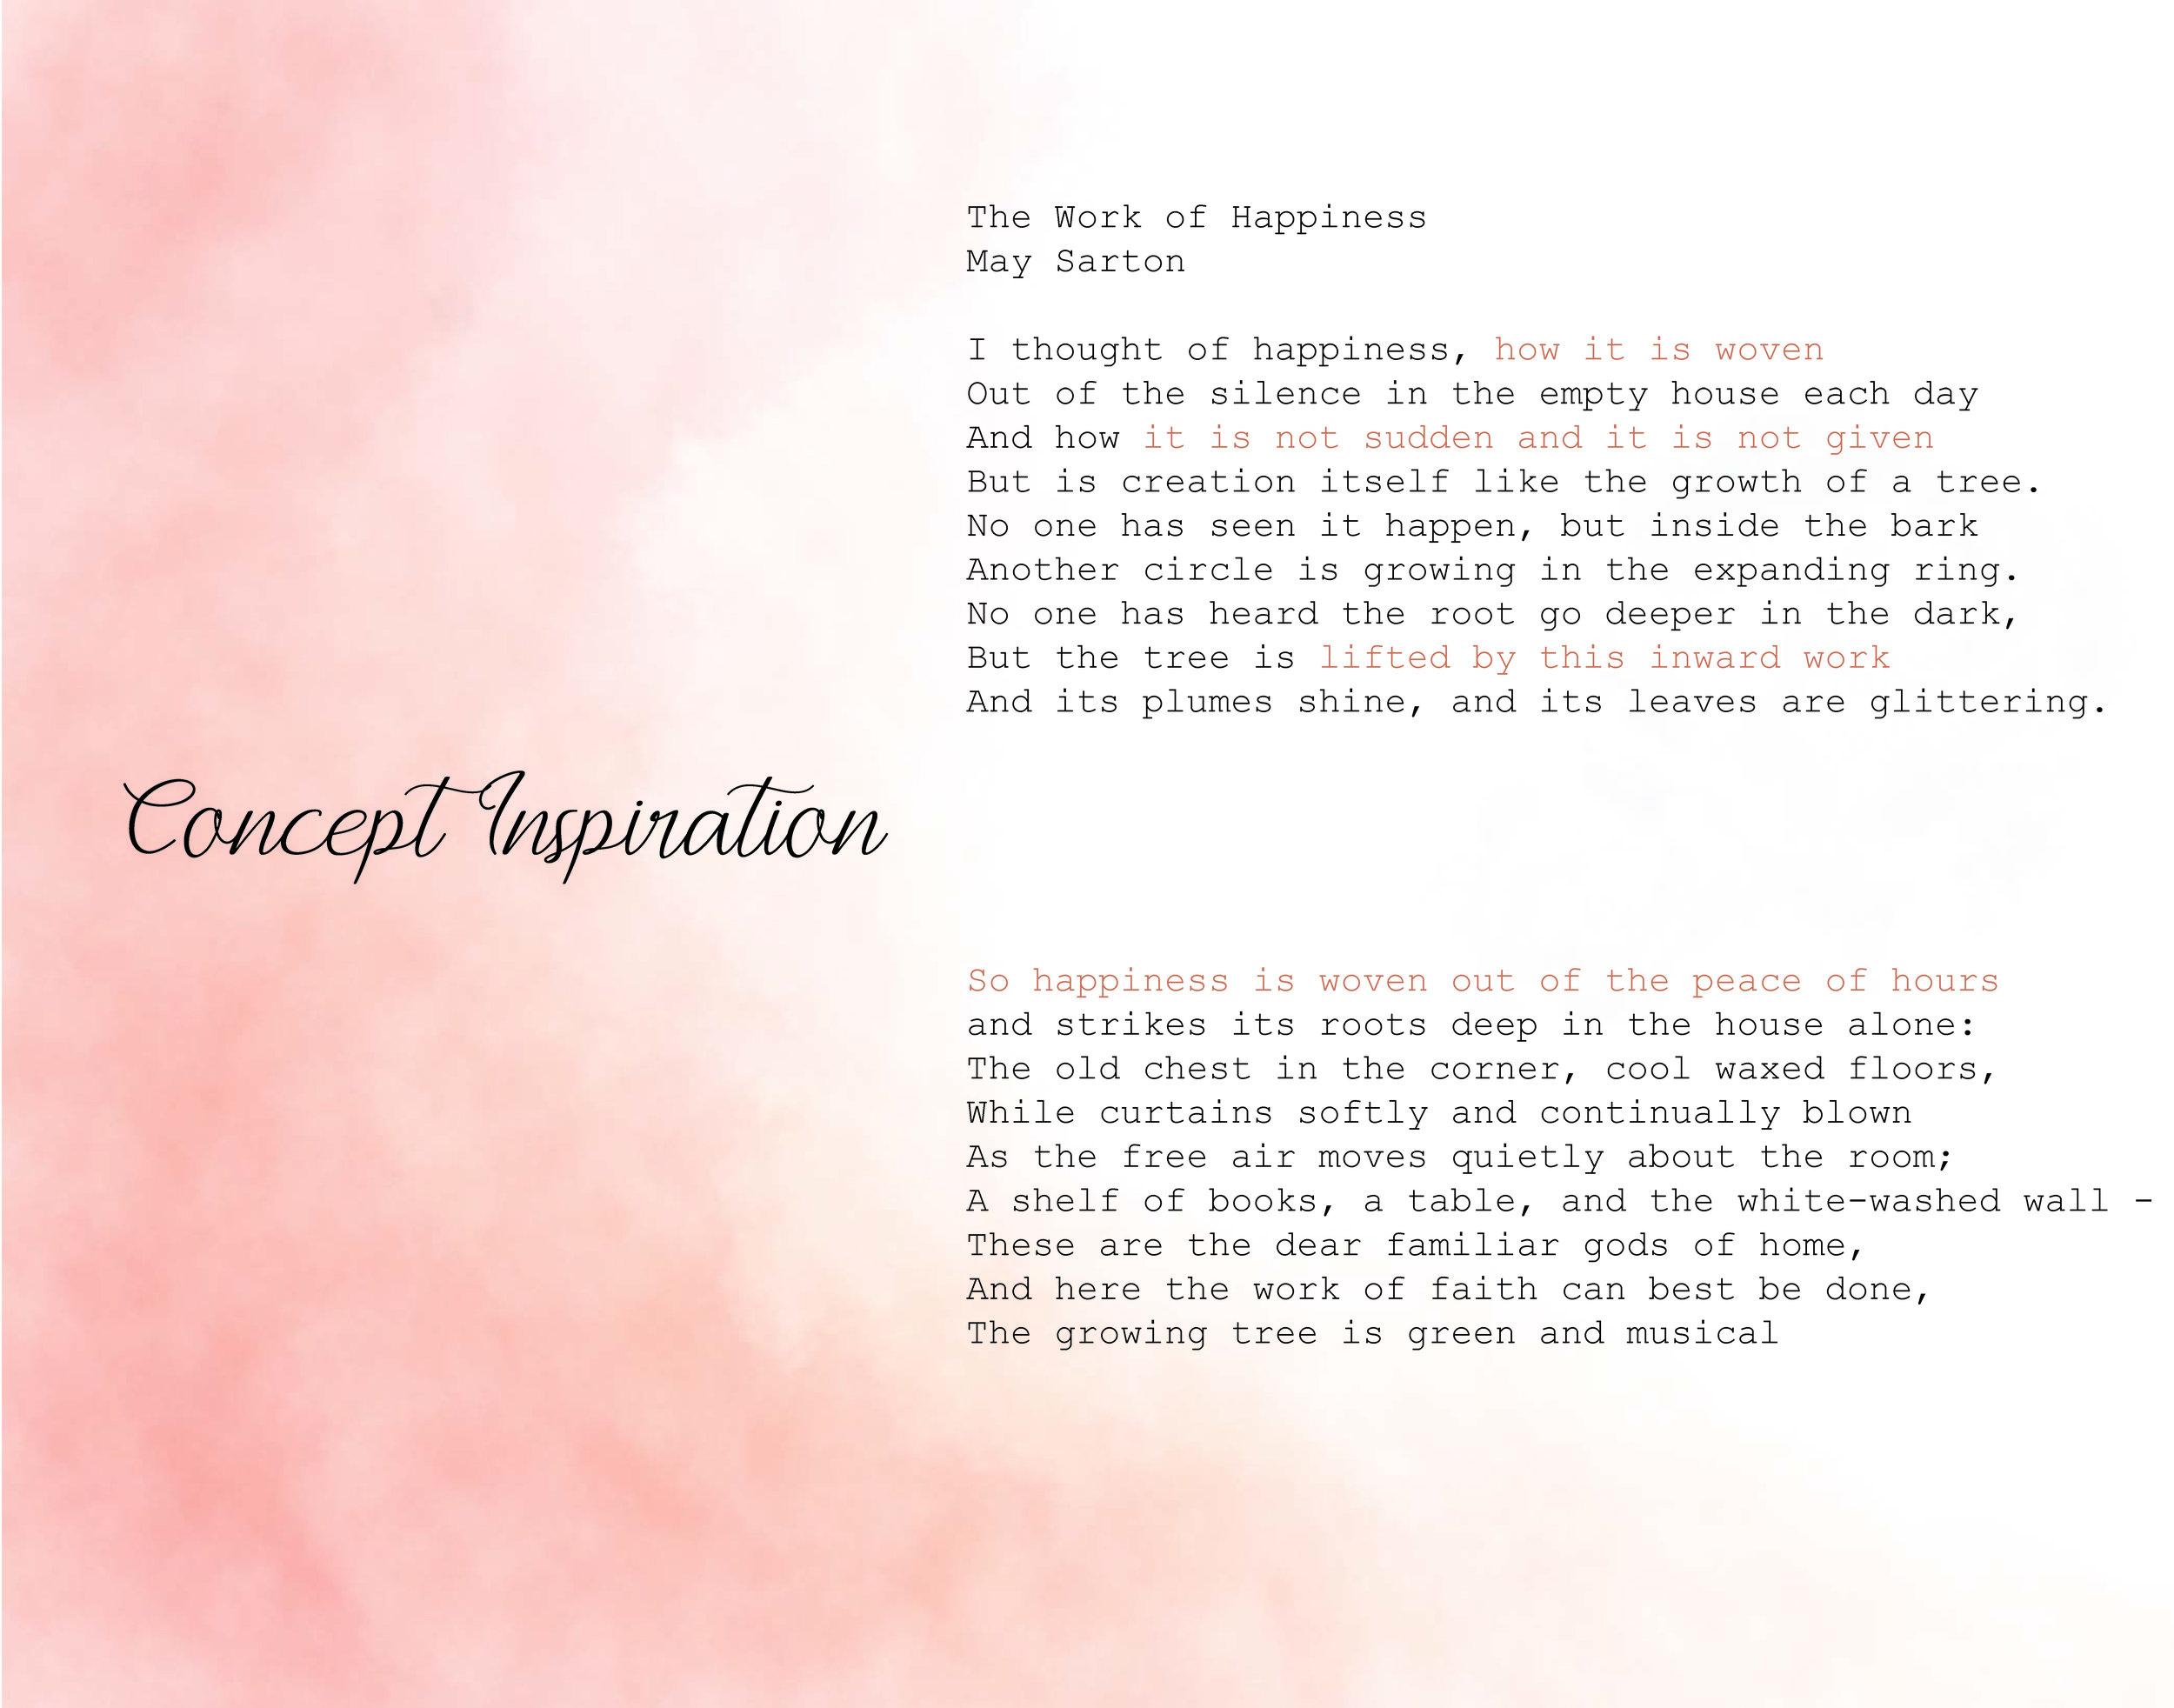 Swanson_Sarah_ Eudemonia Concept Inspiration 1